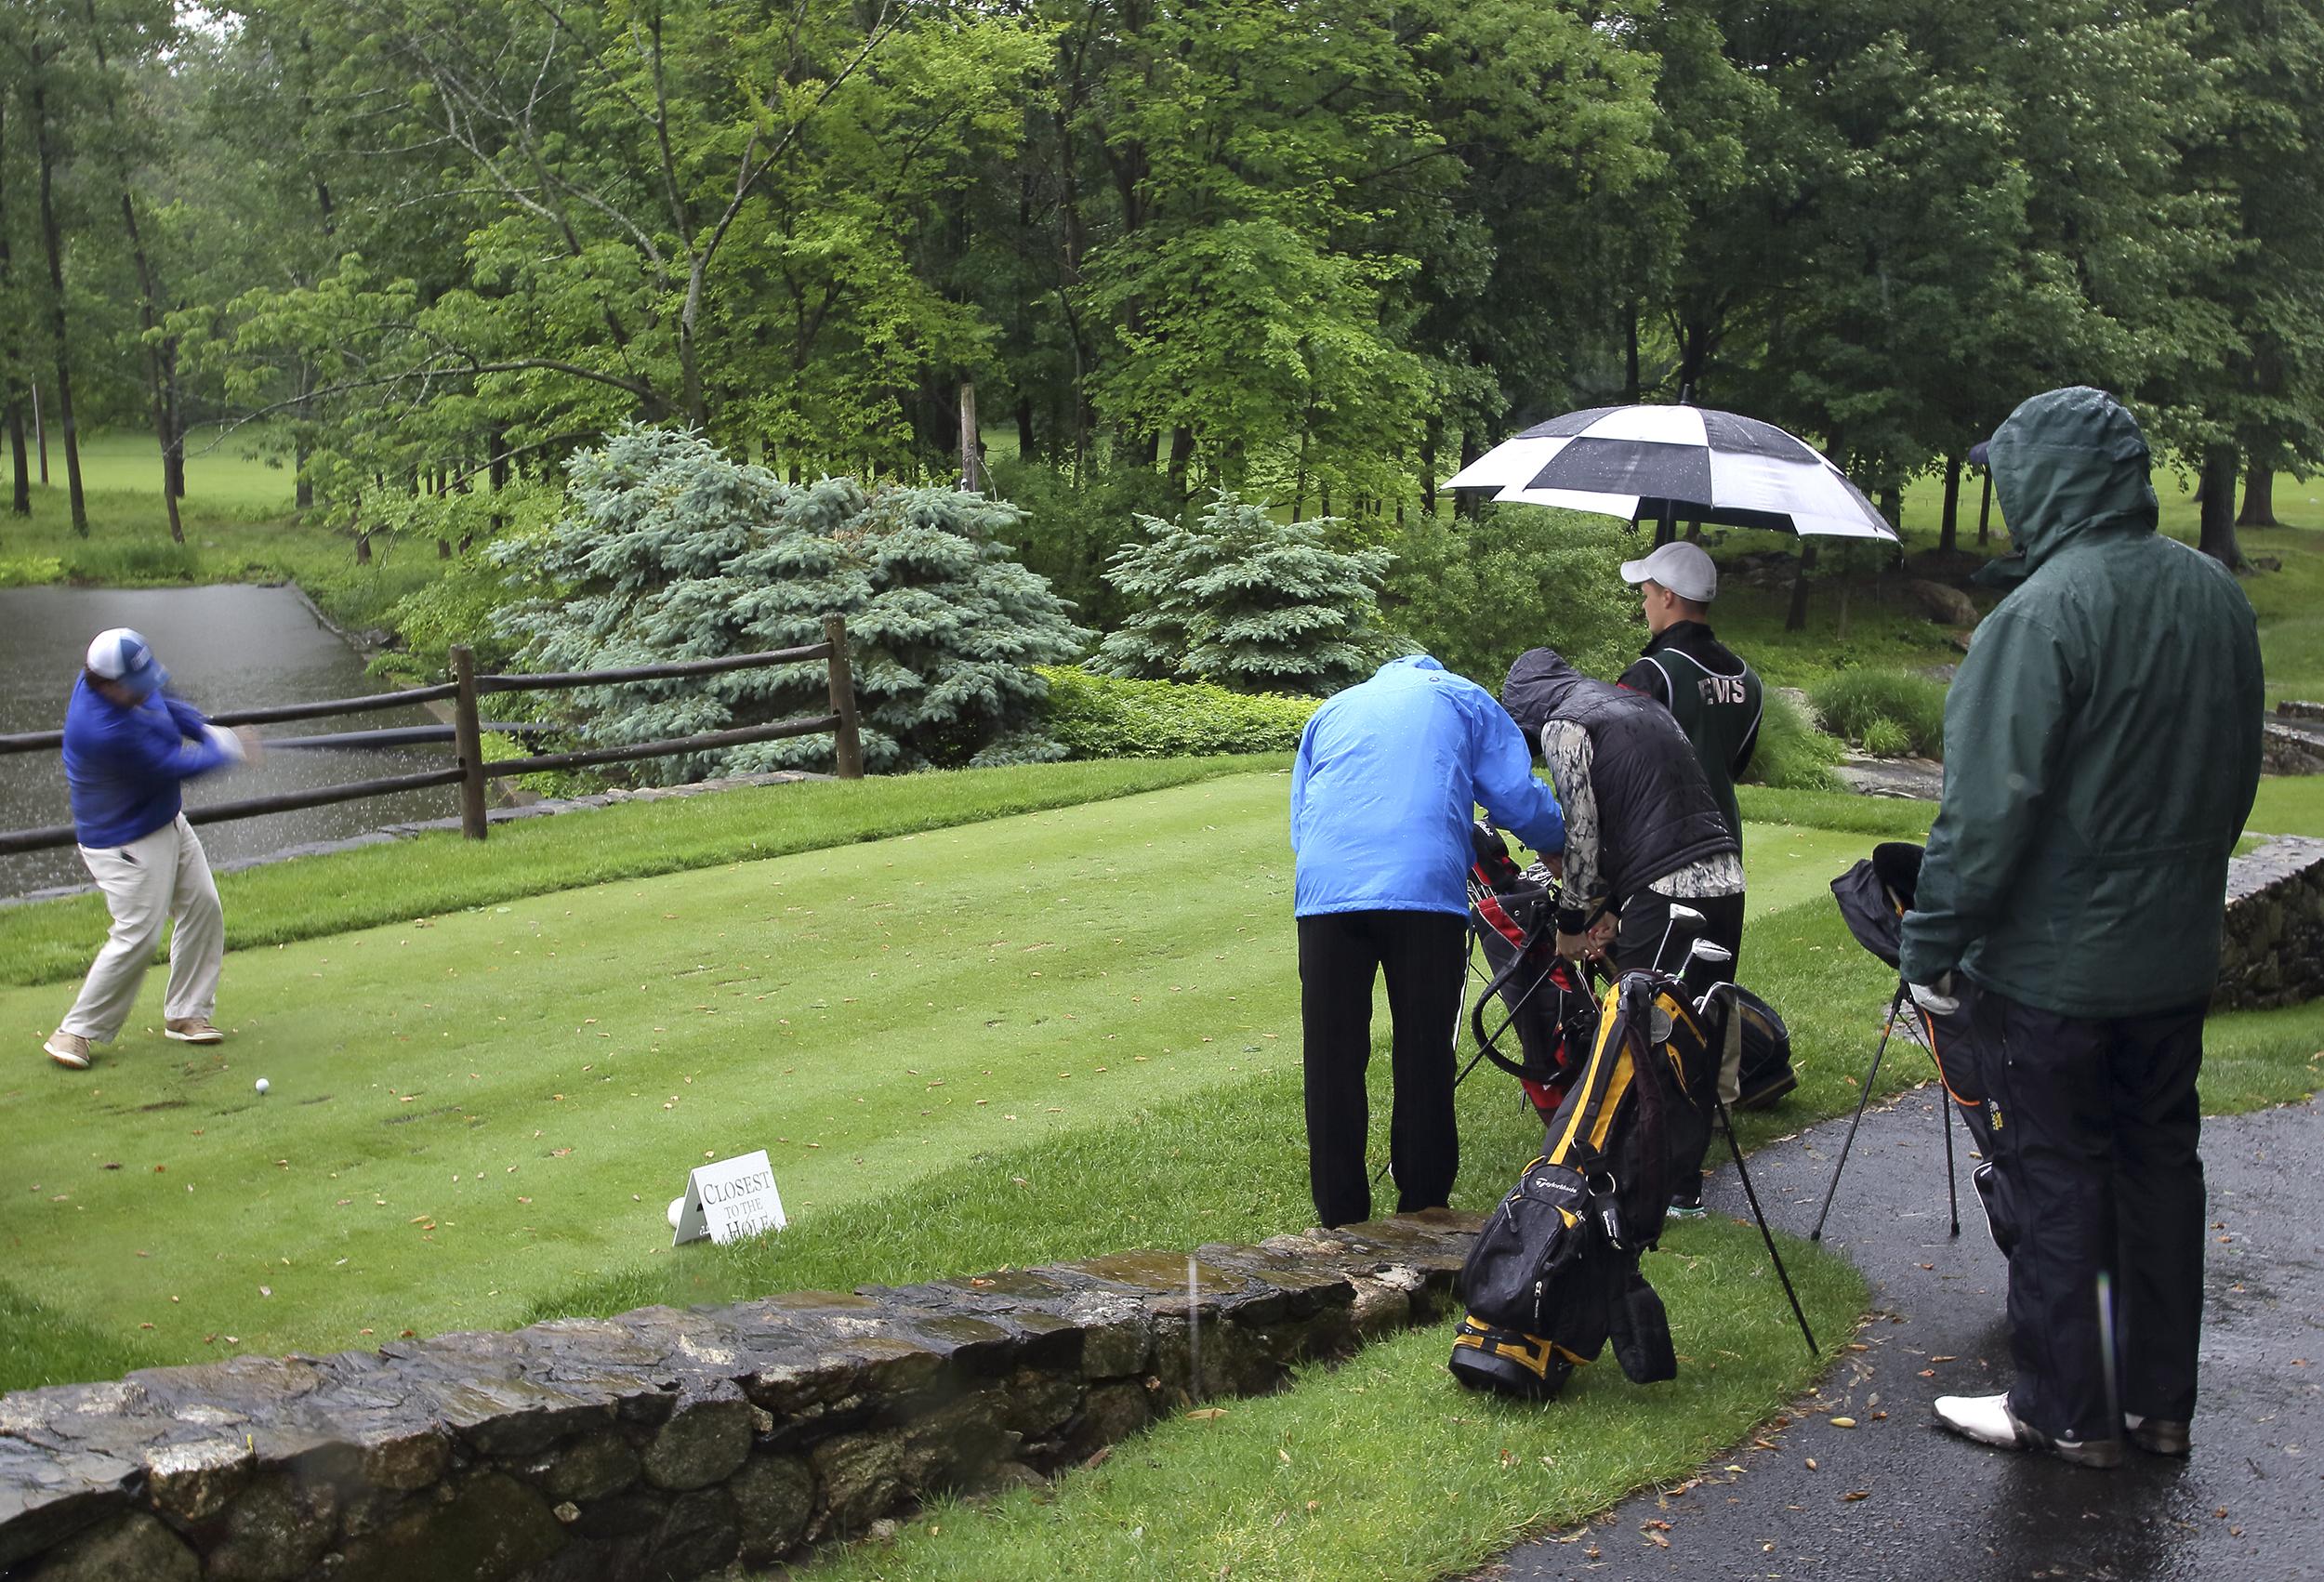 26_AIA Golf Outing Jun15_©SusanFisherPlotner.jpg